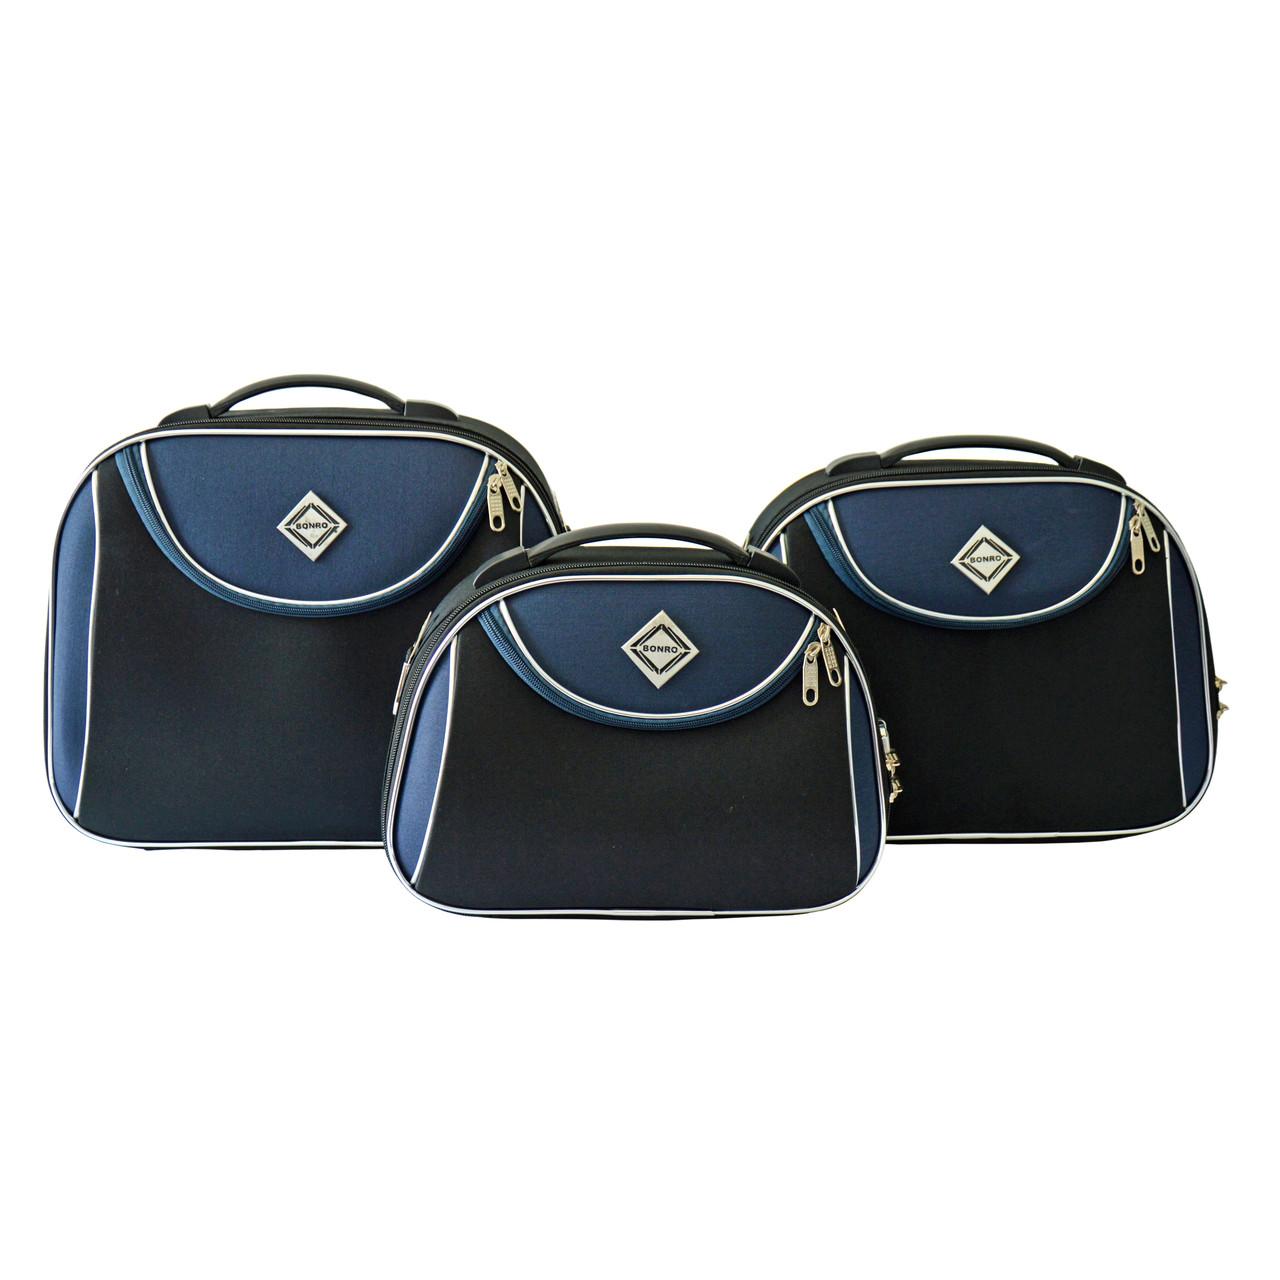 Сумка кейс саквояж 3в1 Bonro Style черно-т. синий